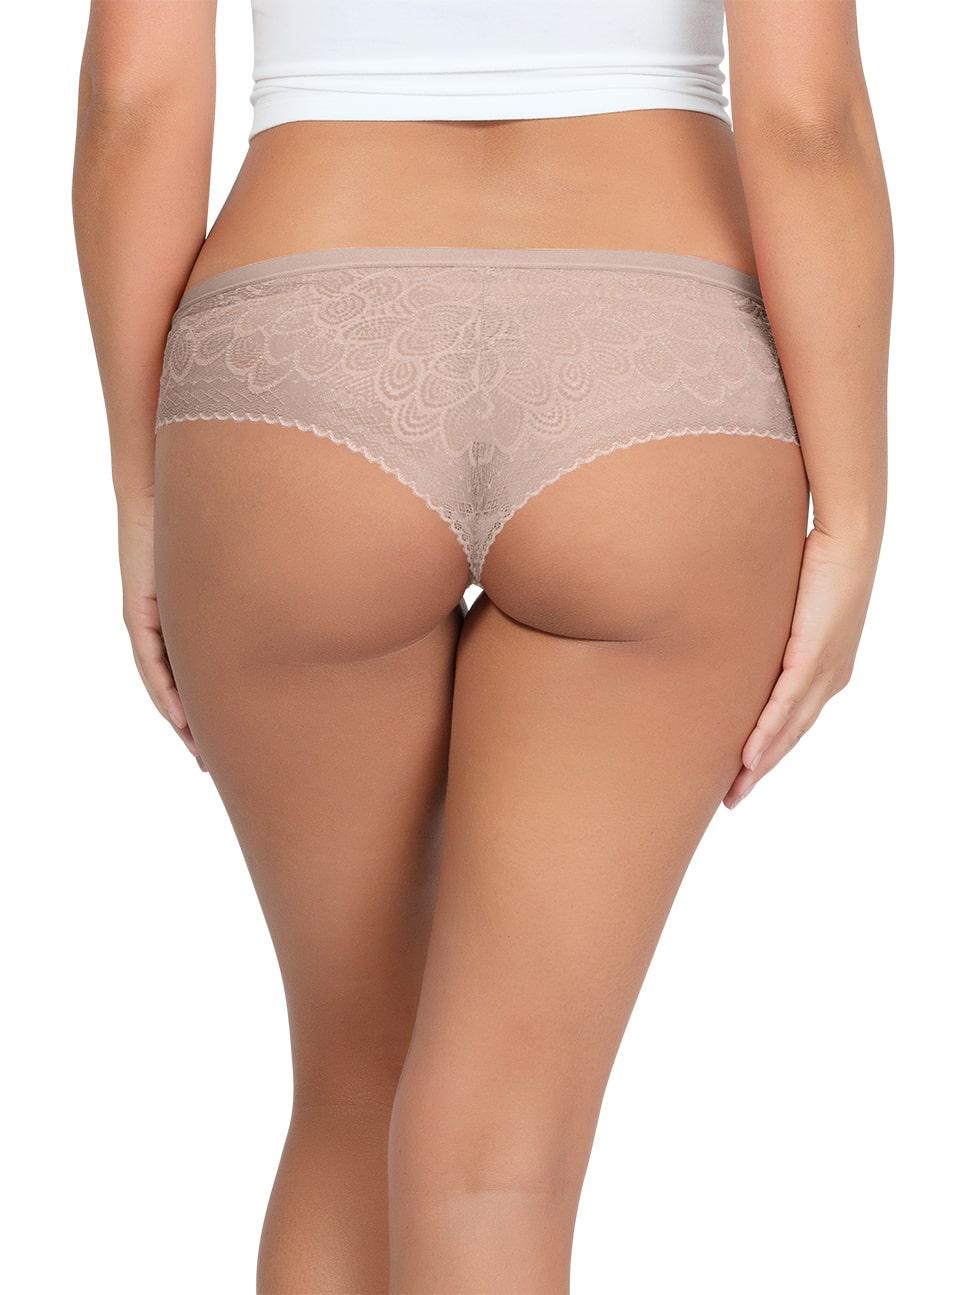 PARFAIT ParfaitPanty SoGlam HipsterPP502 Bare Back 1 - Parfait Panty So Glam Hipster - Bare - PP502